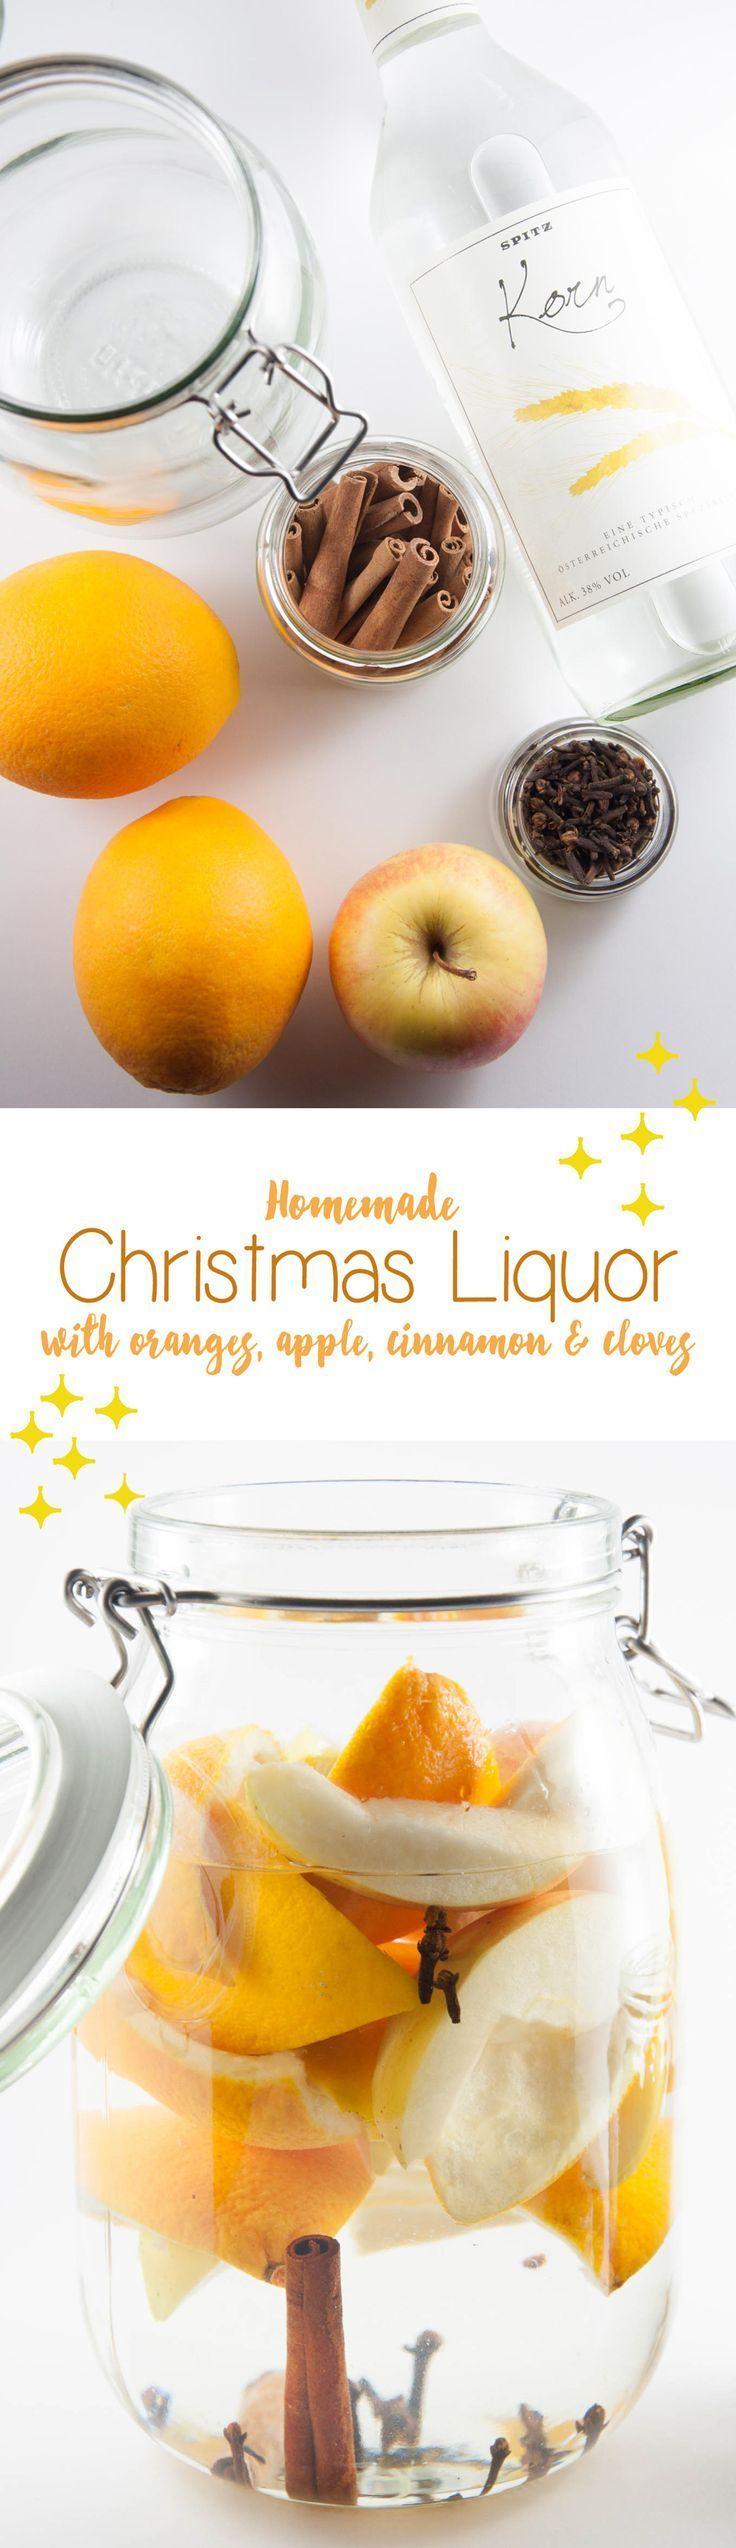 Christmas Liquor Recipe - the perfect gift | Elephantastic Vegan Homemade Christmas Liquor | This Gift  This Gift may refer to: